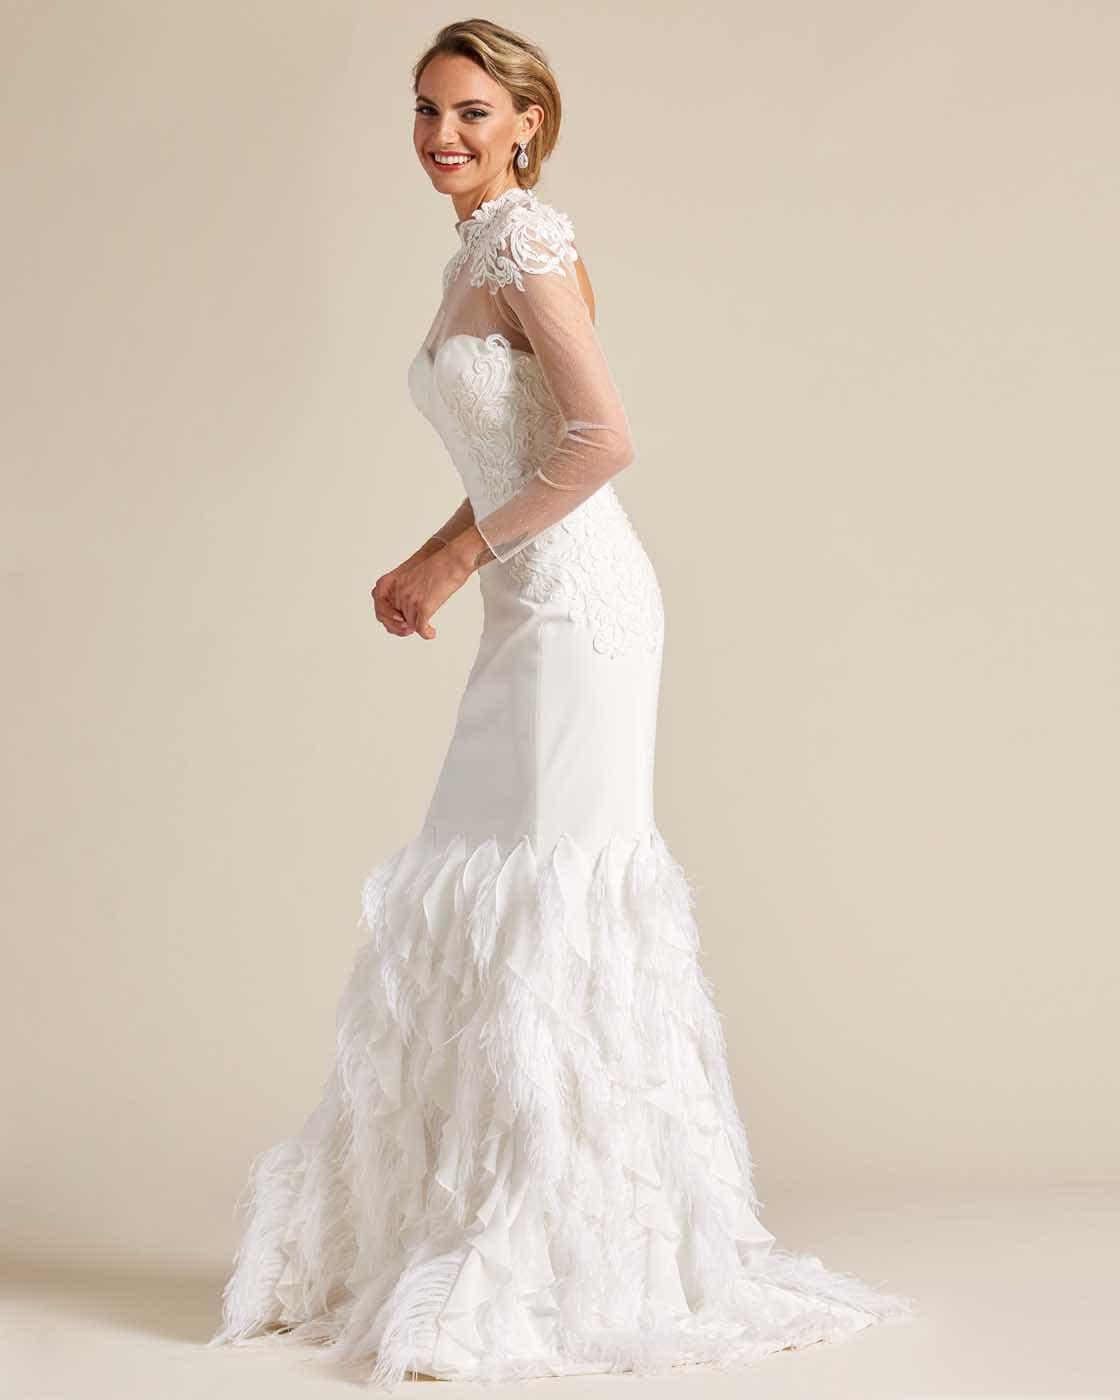 White Ivory Ruffled Mermaid Tail Wedding Gown - Side